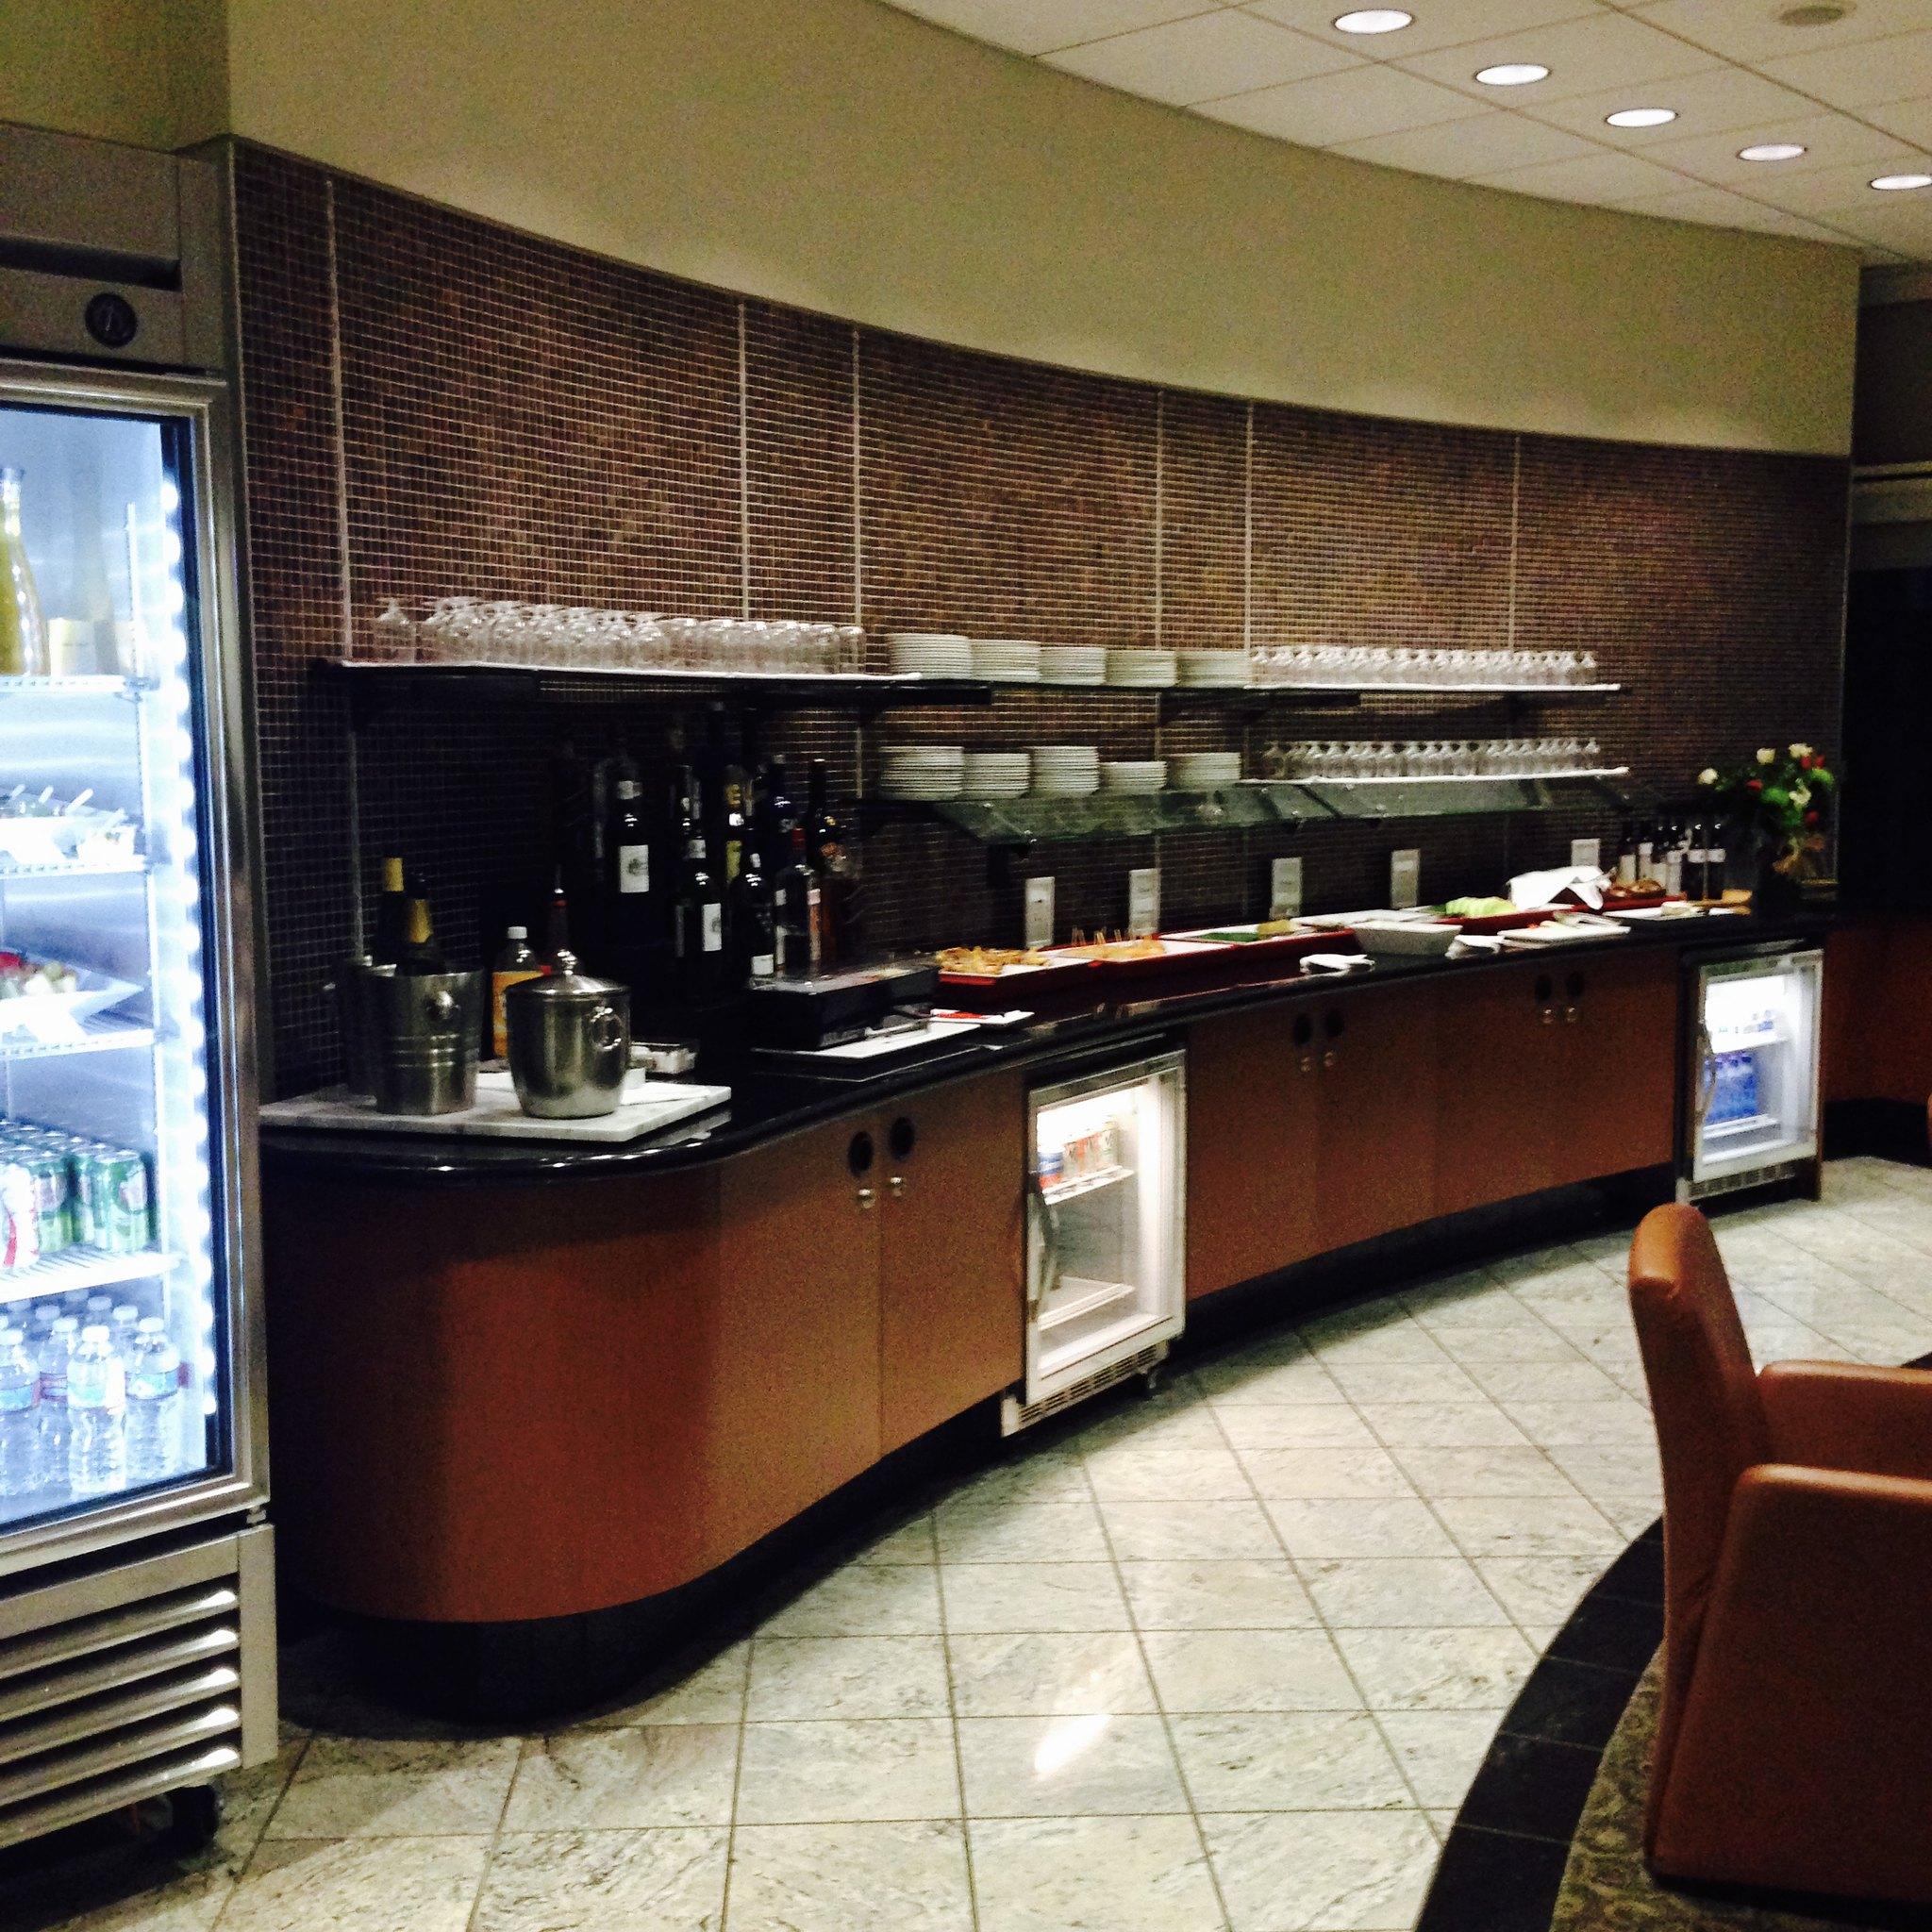 Air France/KLM Lounge at SFO